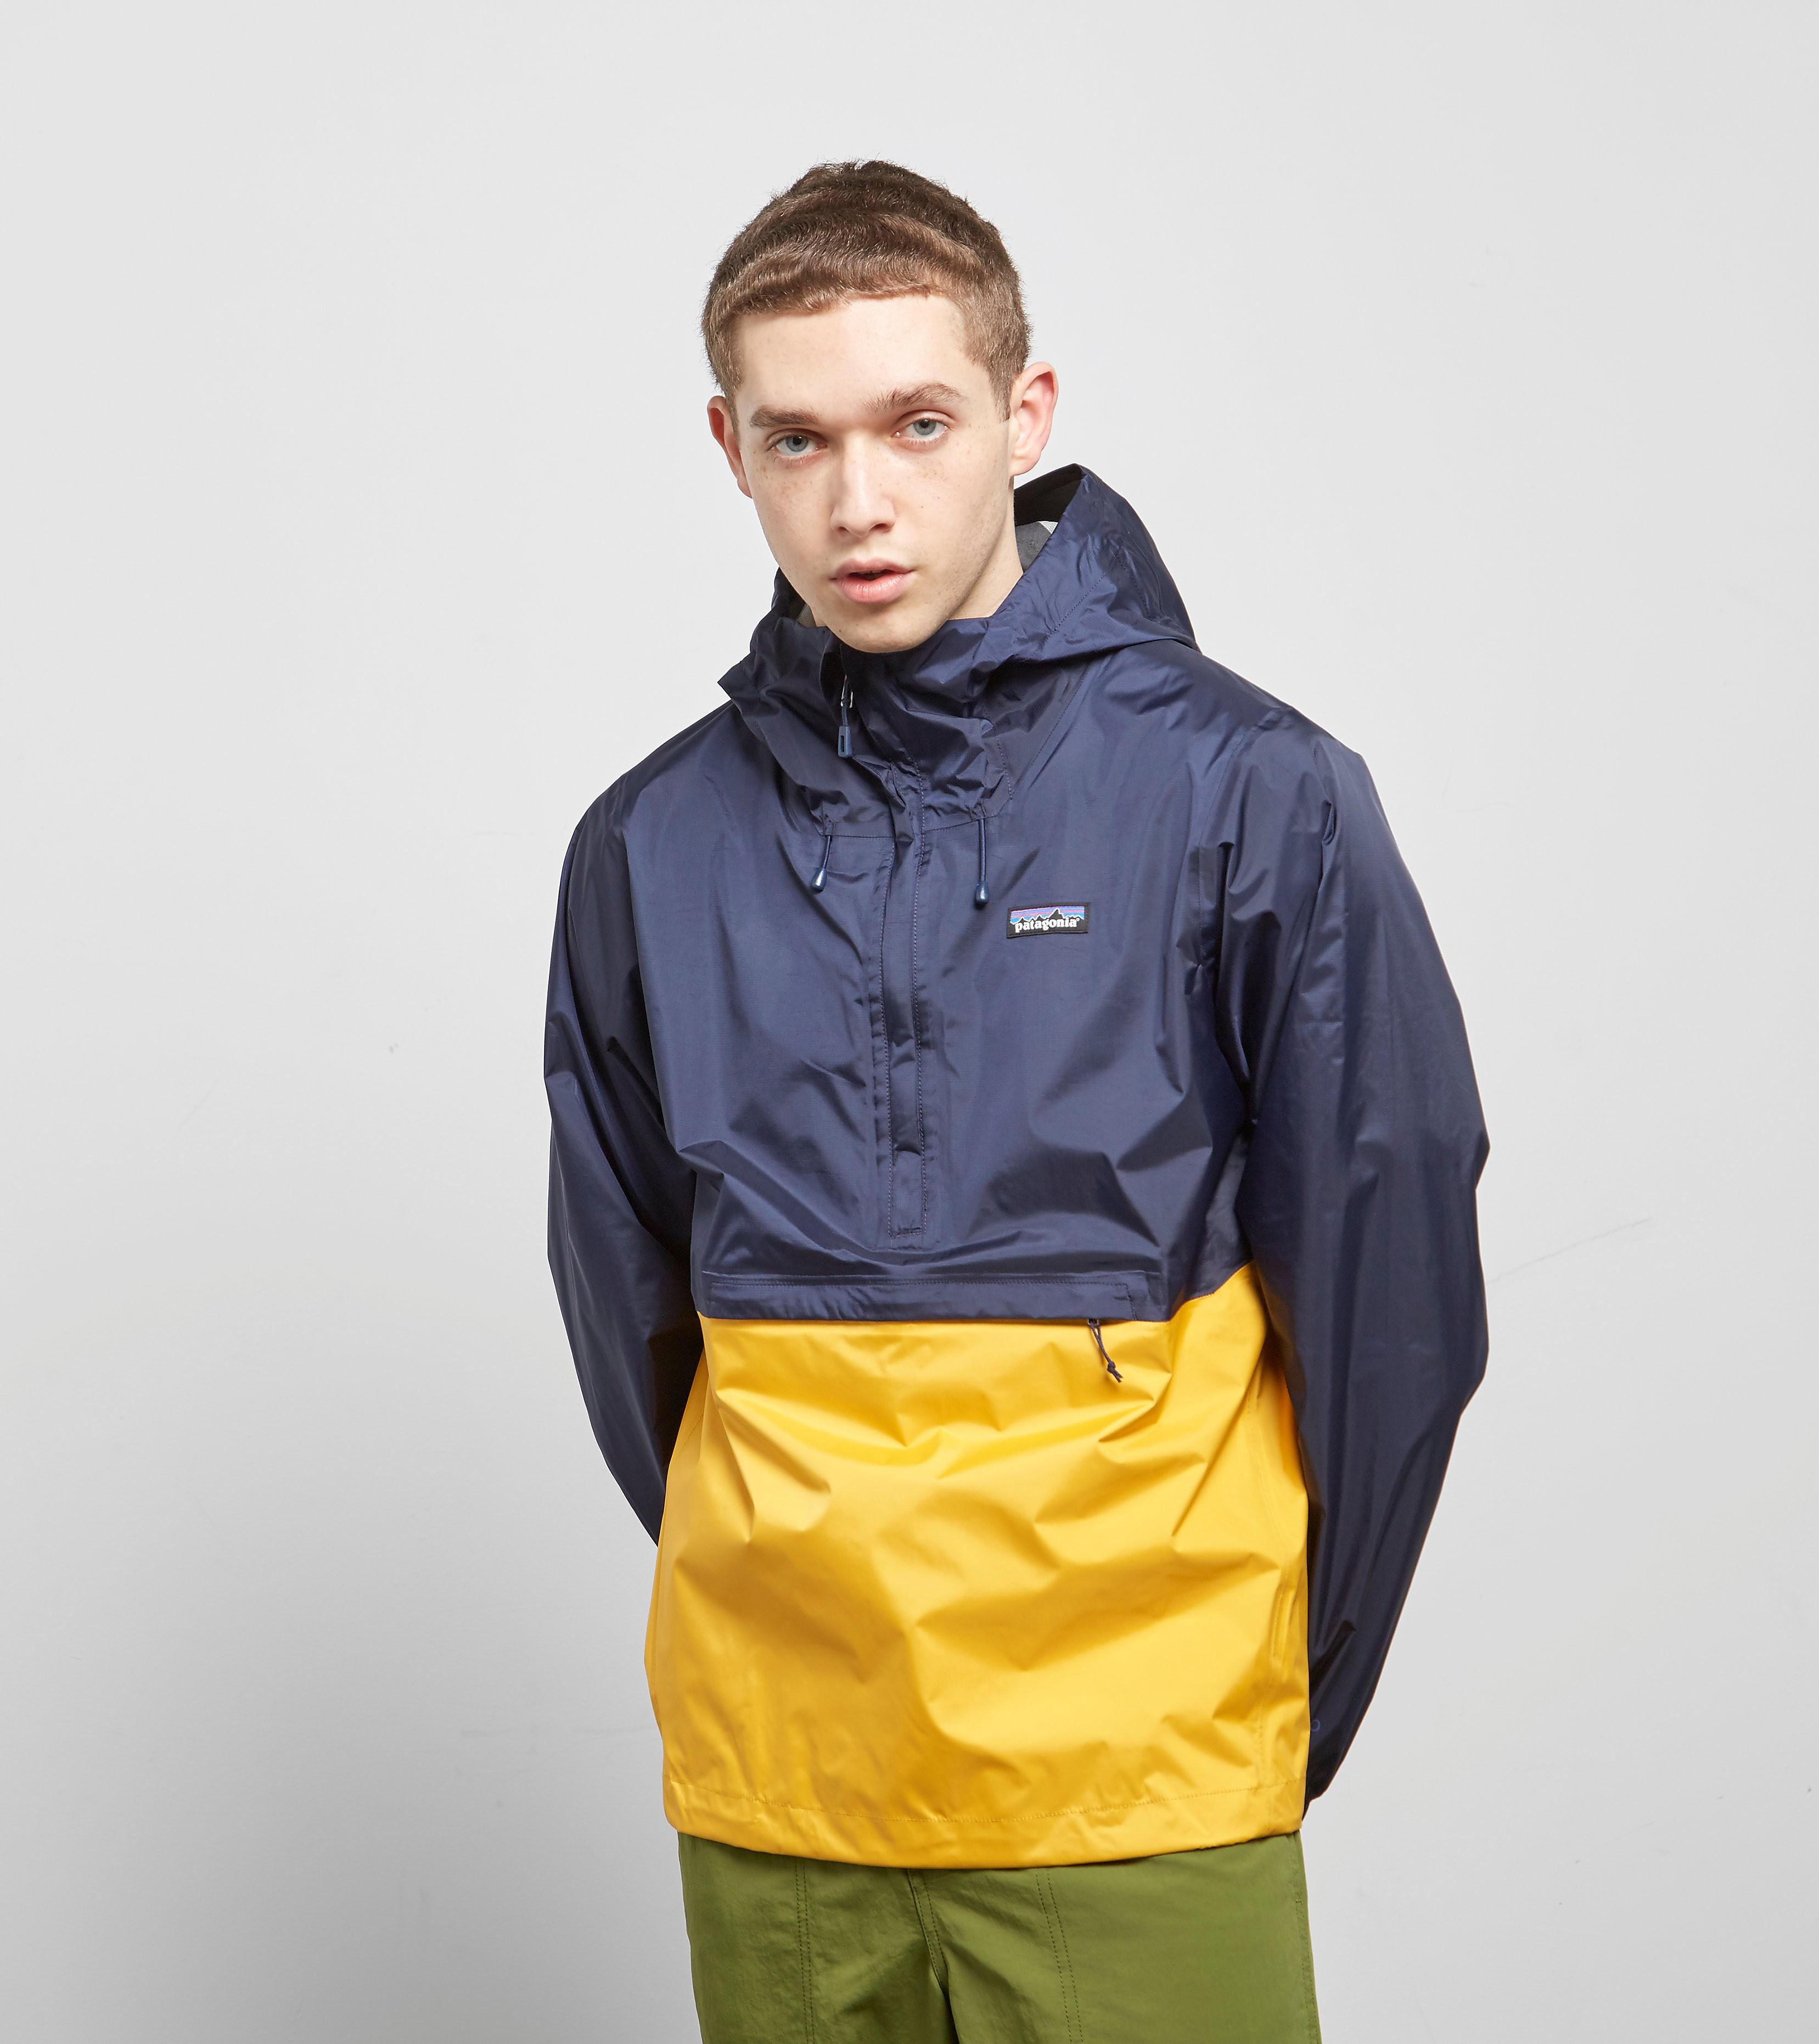 Patagonia Torrentshell Half Zip Jacket